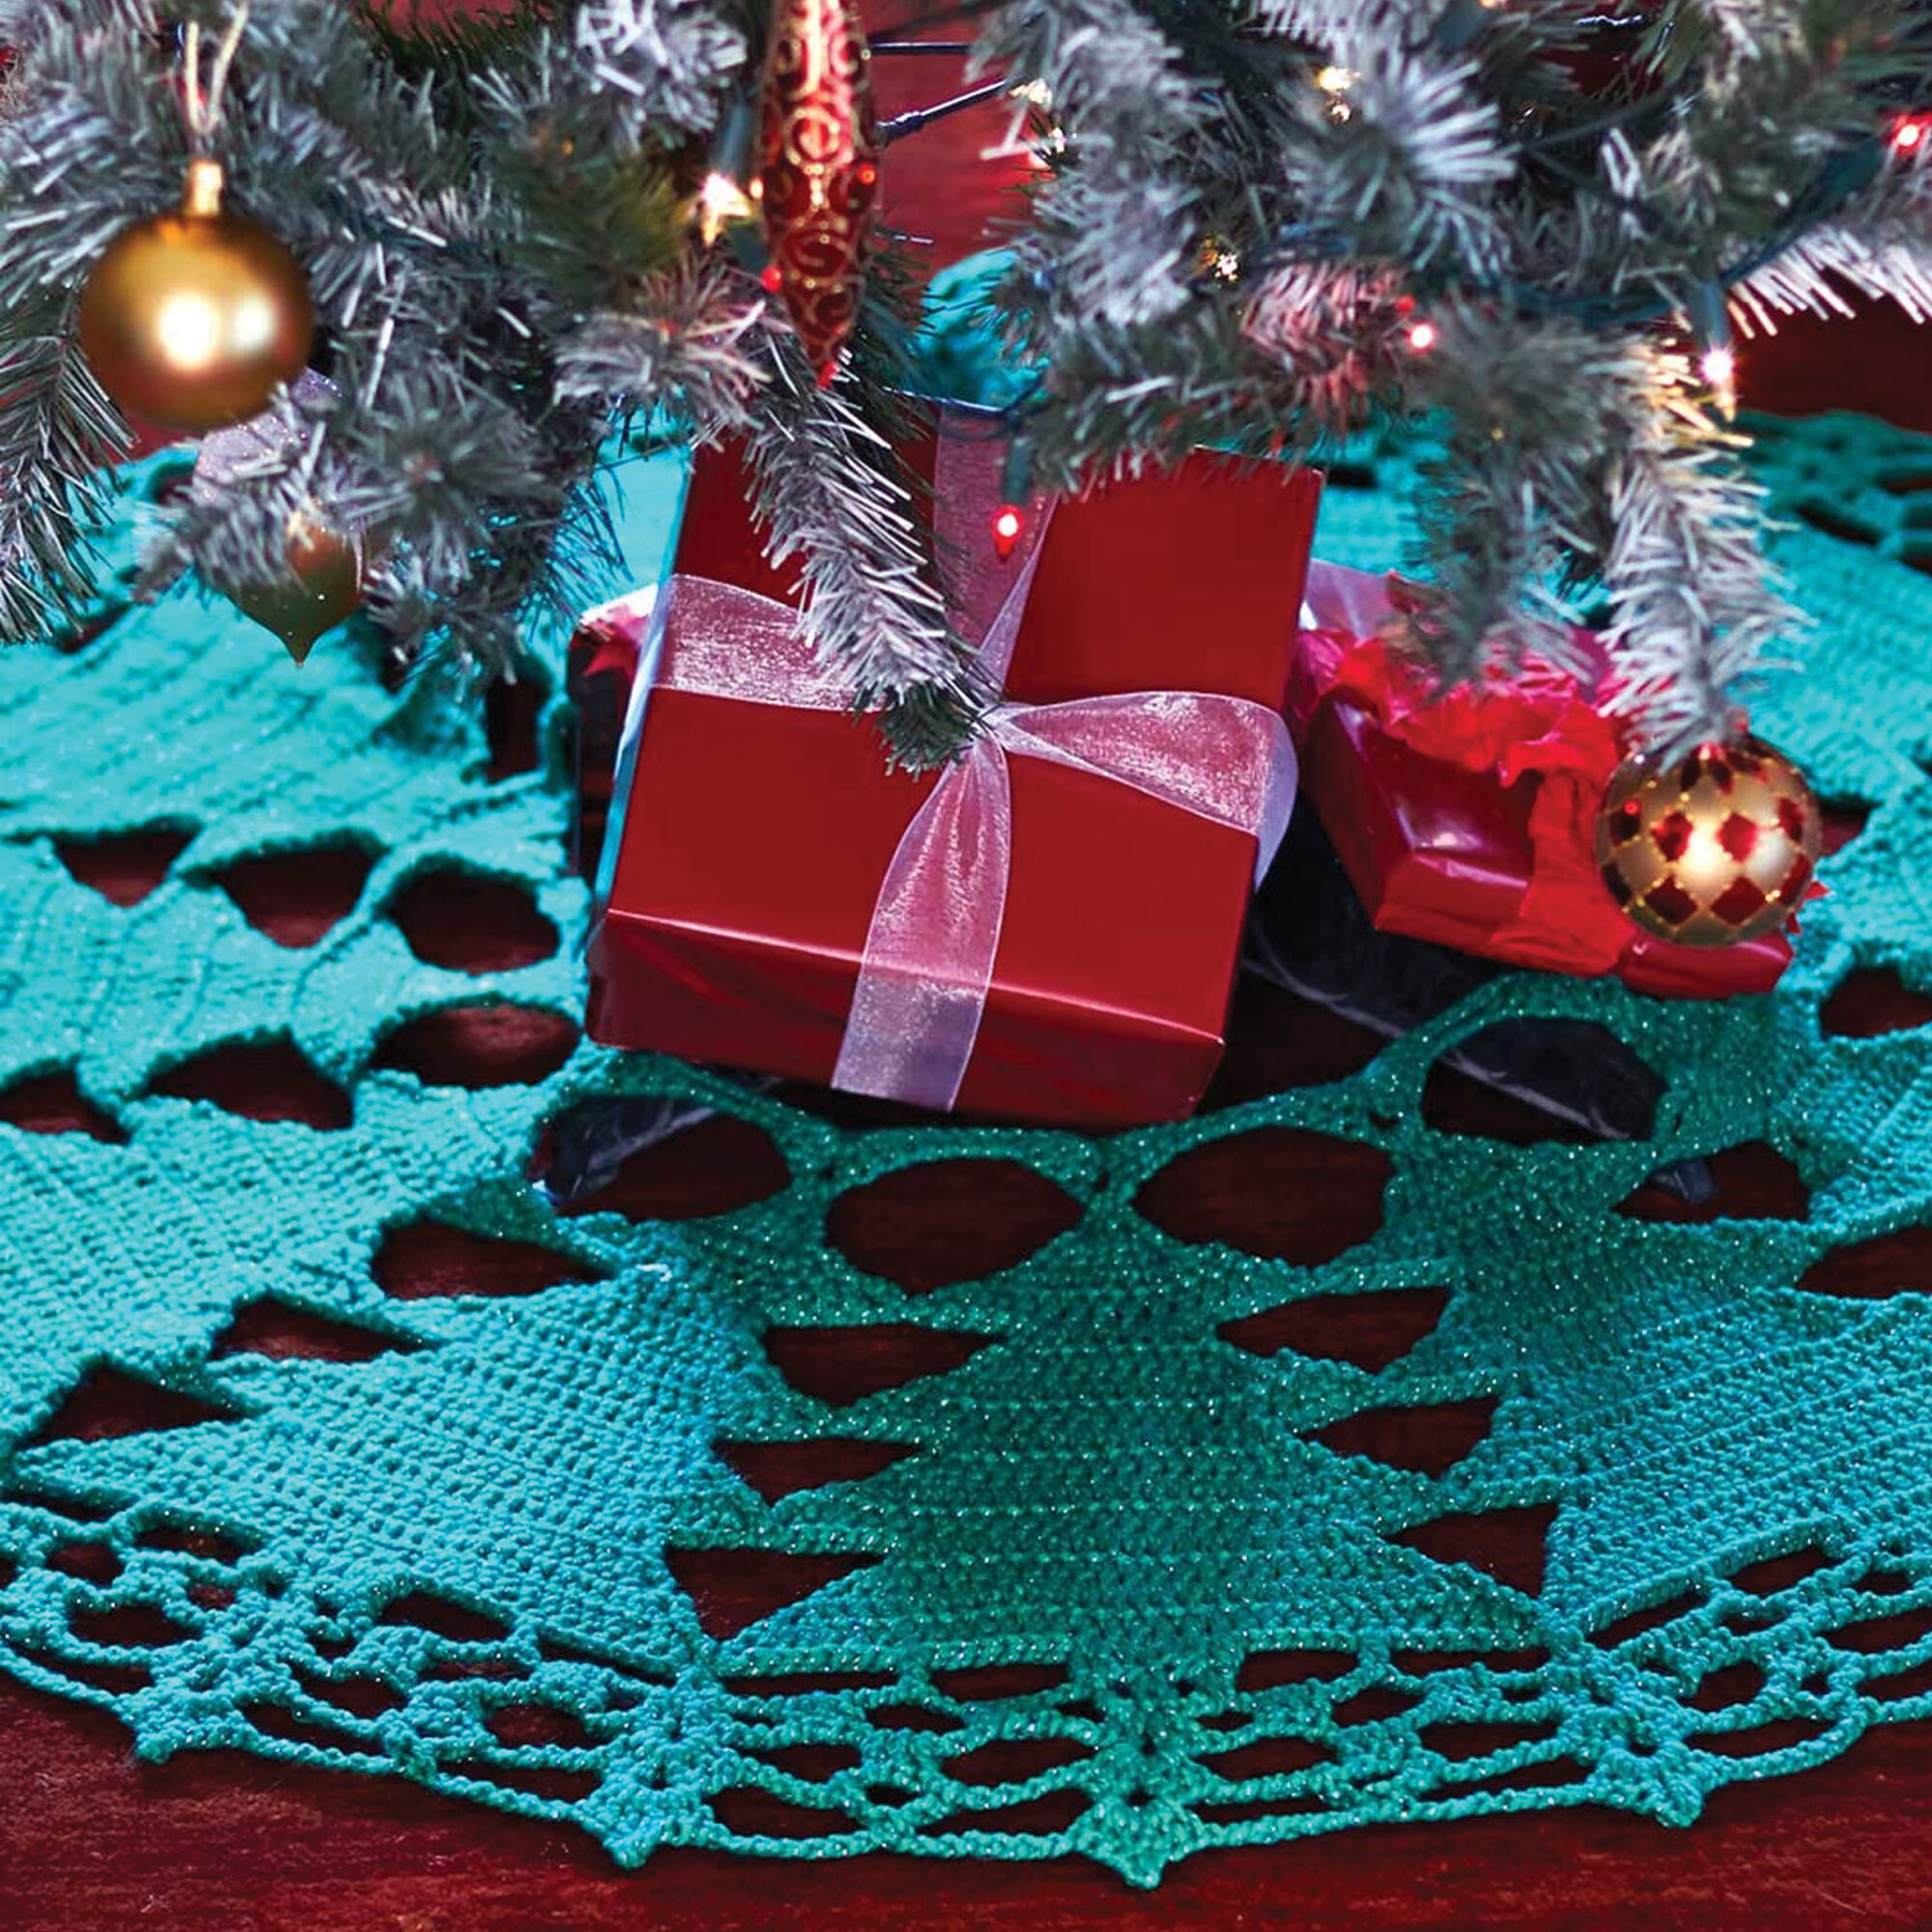 bernat christmas tree skirt bernat christmas tree skirt - Teal Christmas Tree Skirt